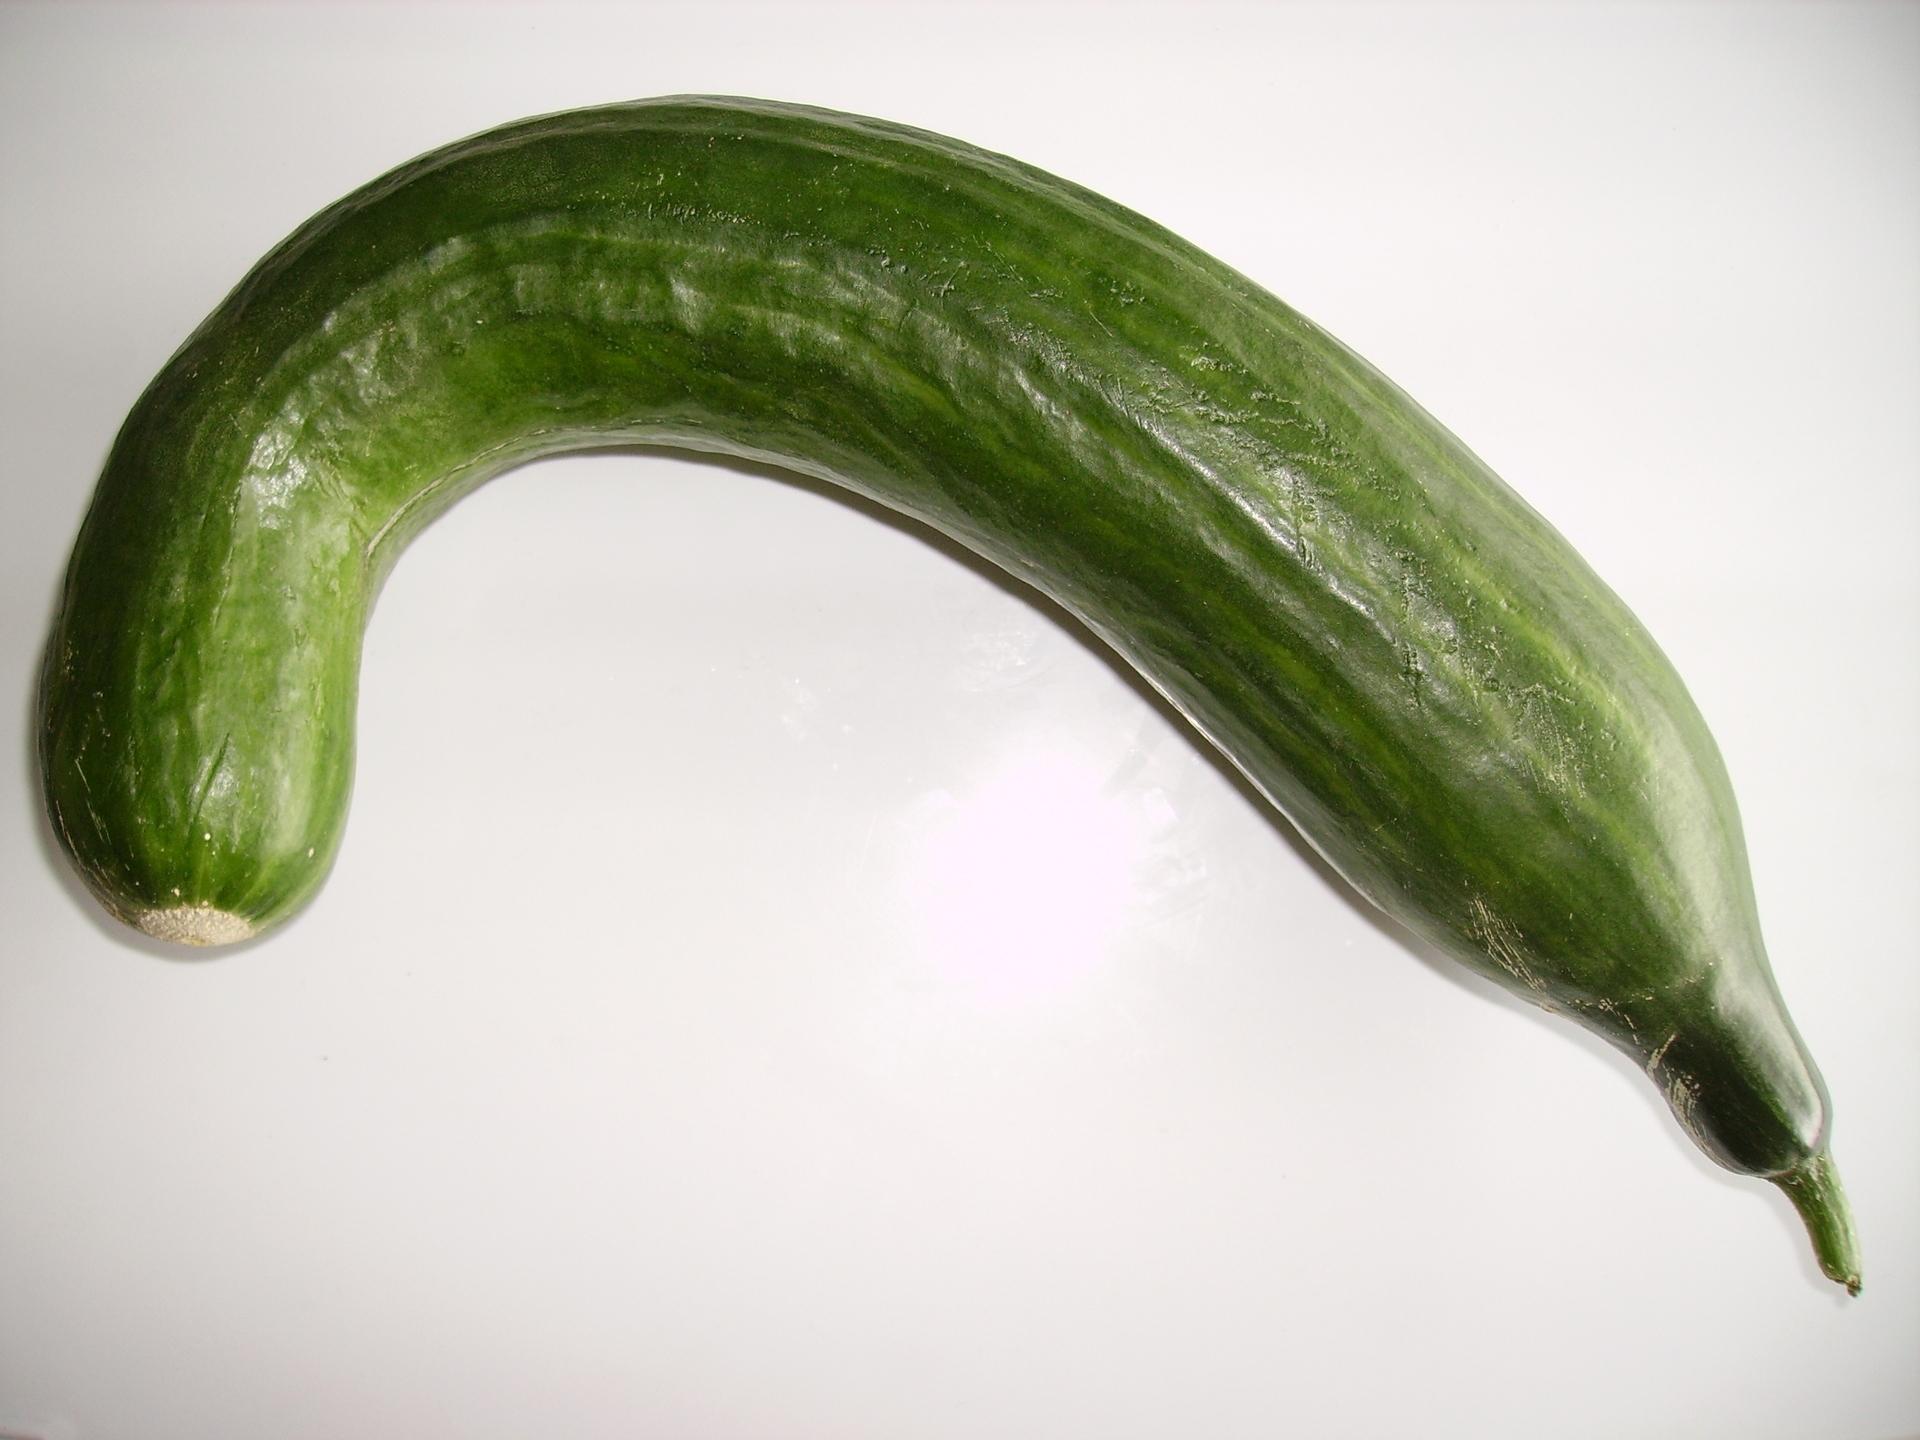 File:Bended cucumber.jpg